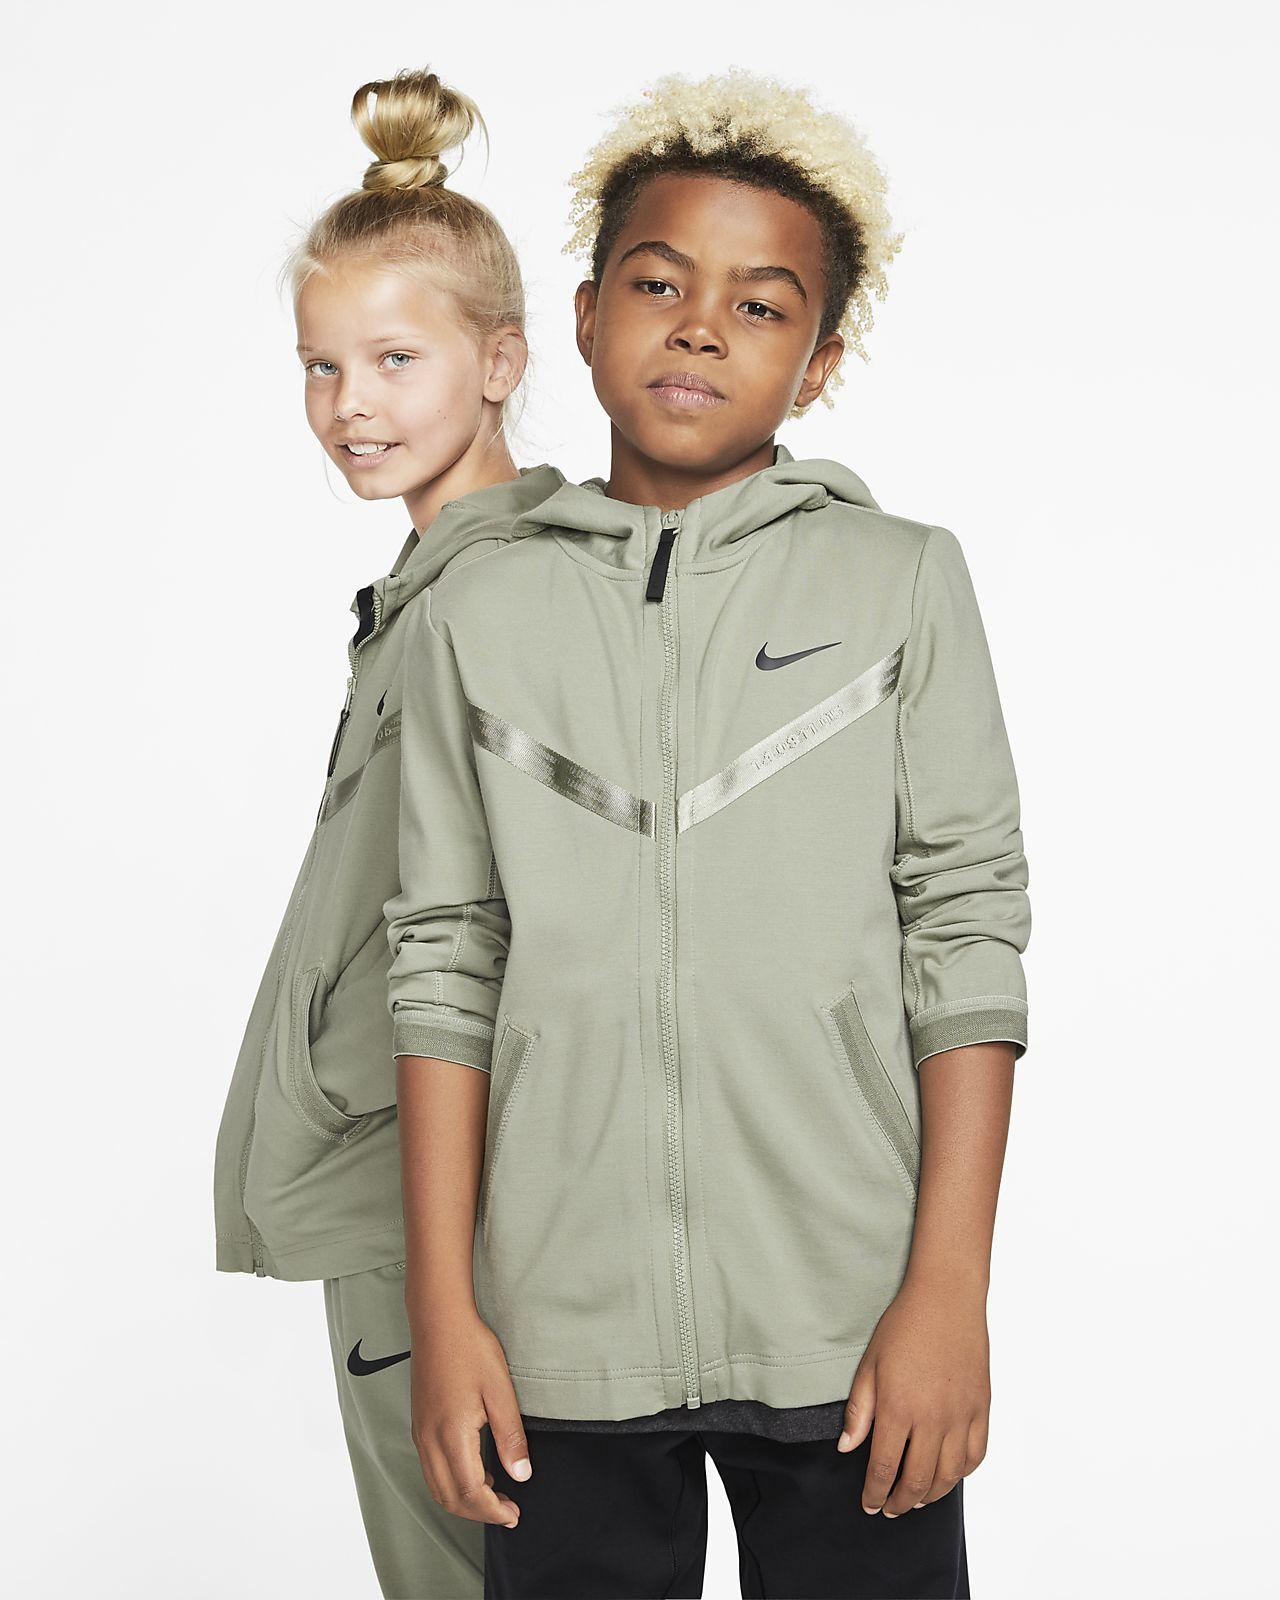 Nike Sportswear Tech Pack Dessuadora amb caputxa i cremallera completa - Nen/a